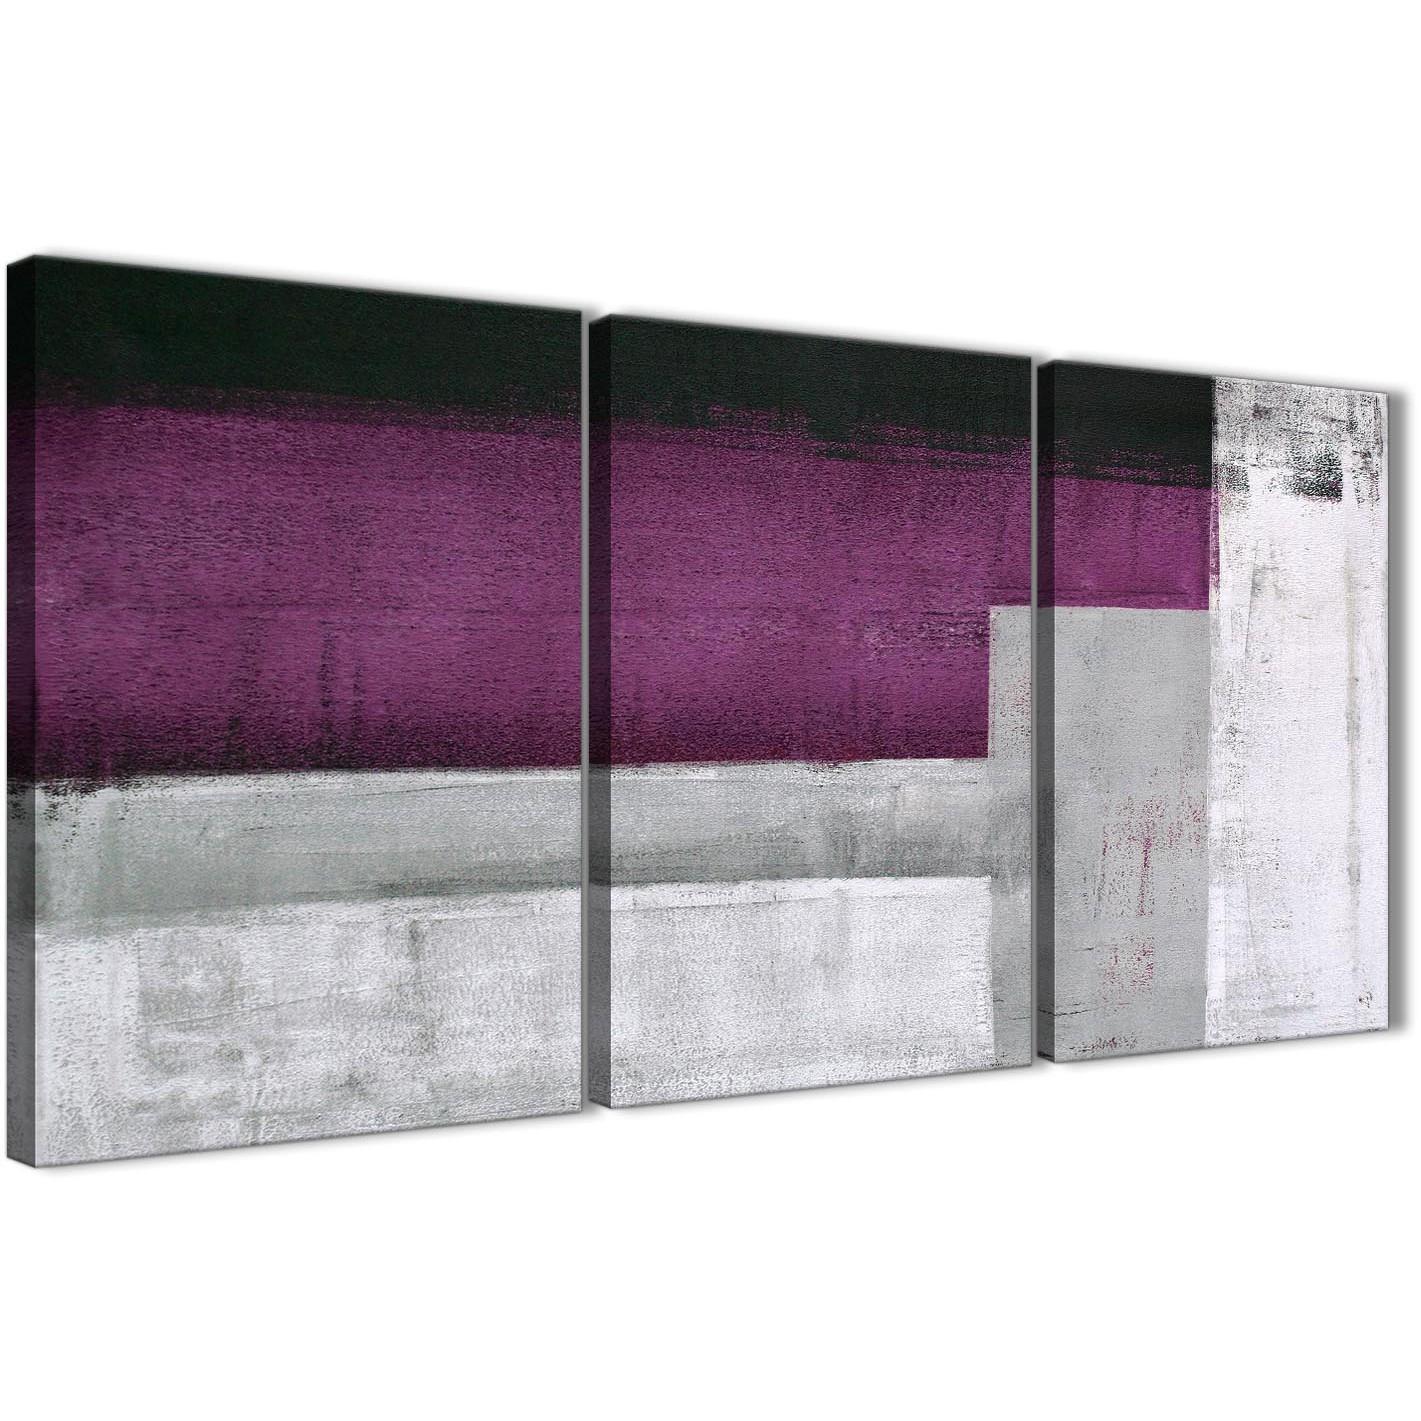 Plum Purple Grey Painting Kitchen Canvas Pictures: 3 Piece Purple Grey Painting Dining Room Canvas Pictures